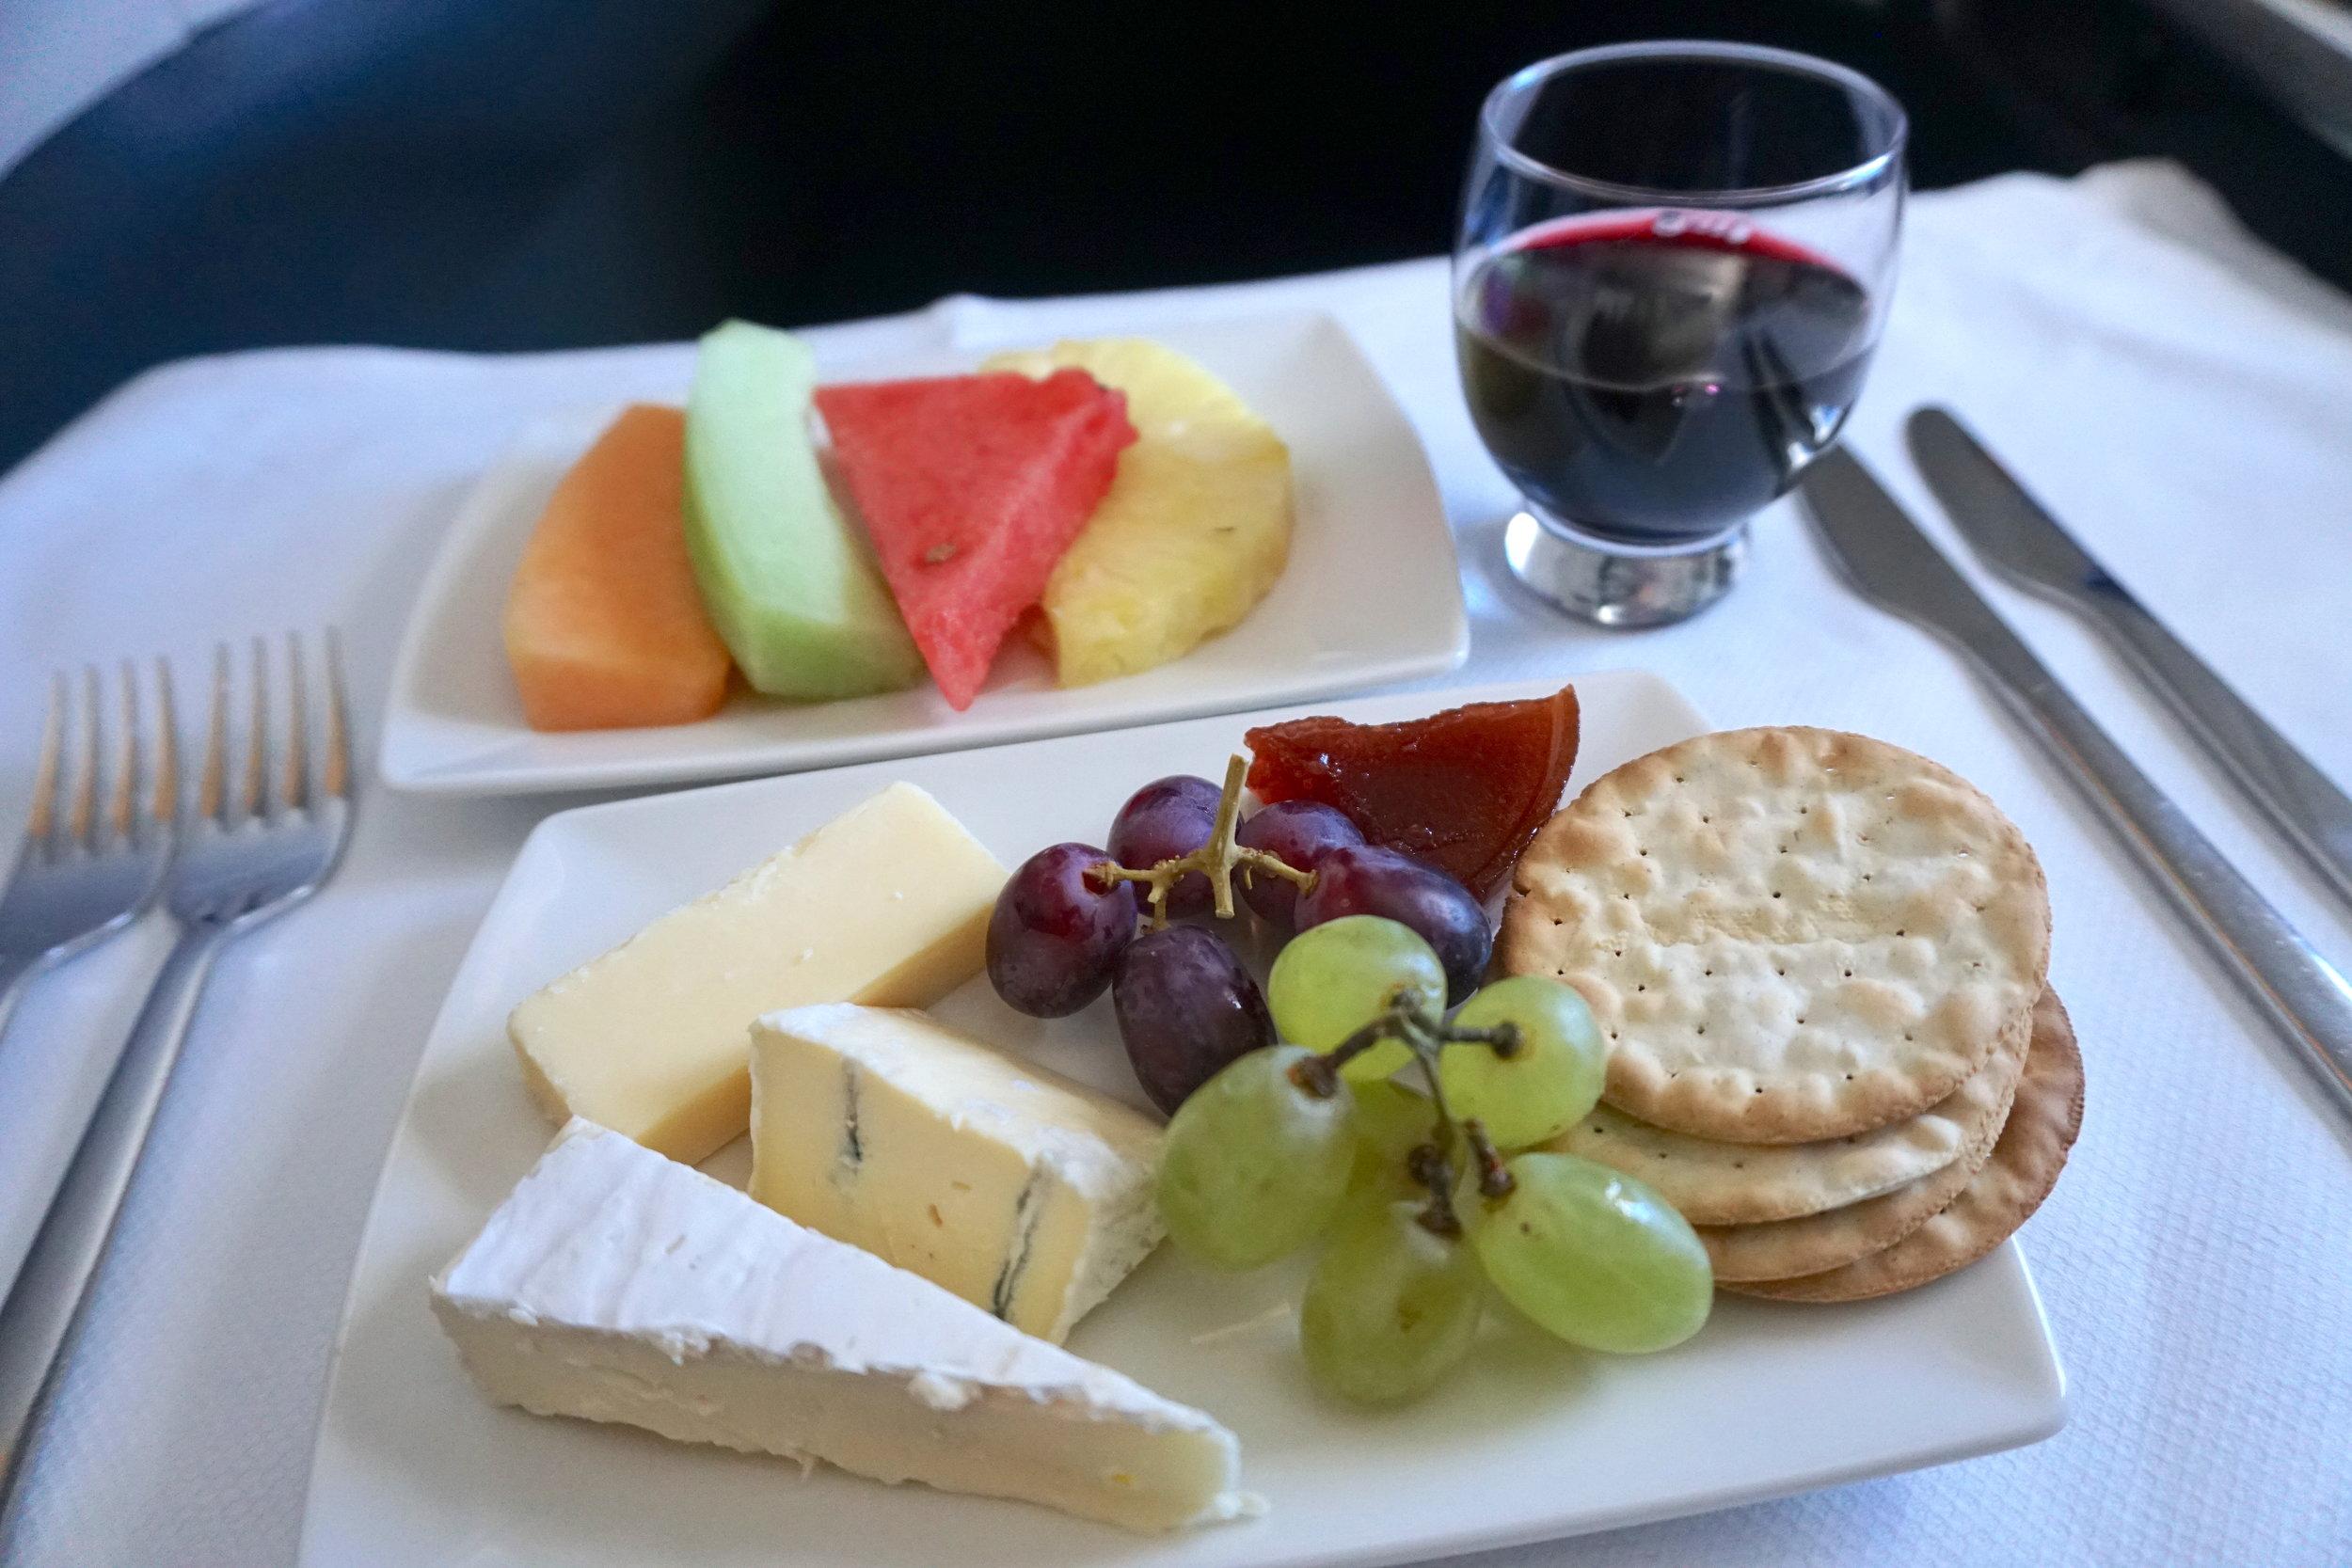 Chic snacks: Wine and cheese